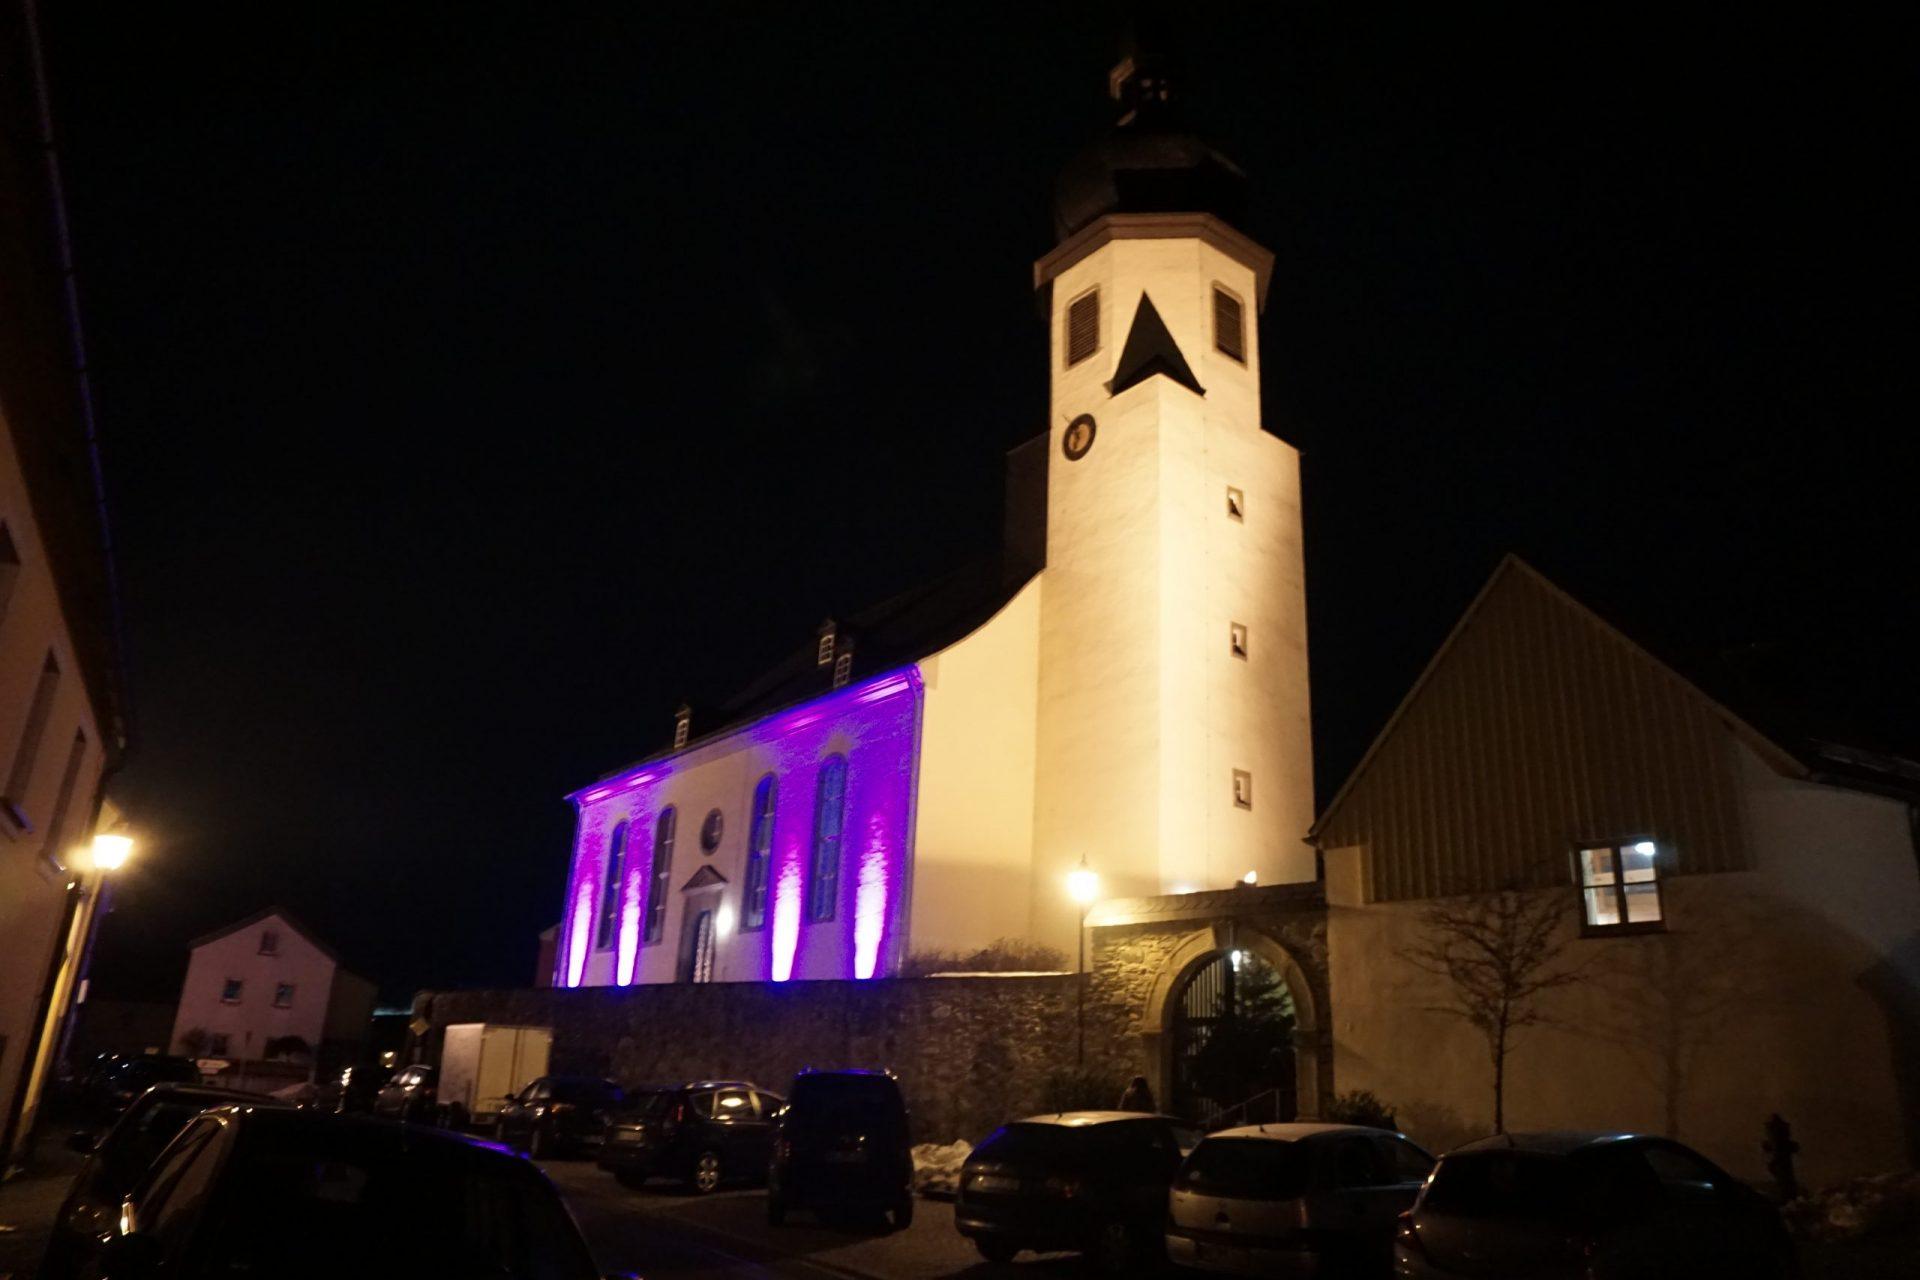 Kirche Trogen zum Splash-Gottesdienst 2017